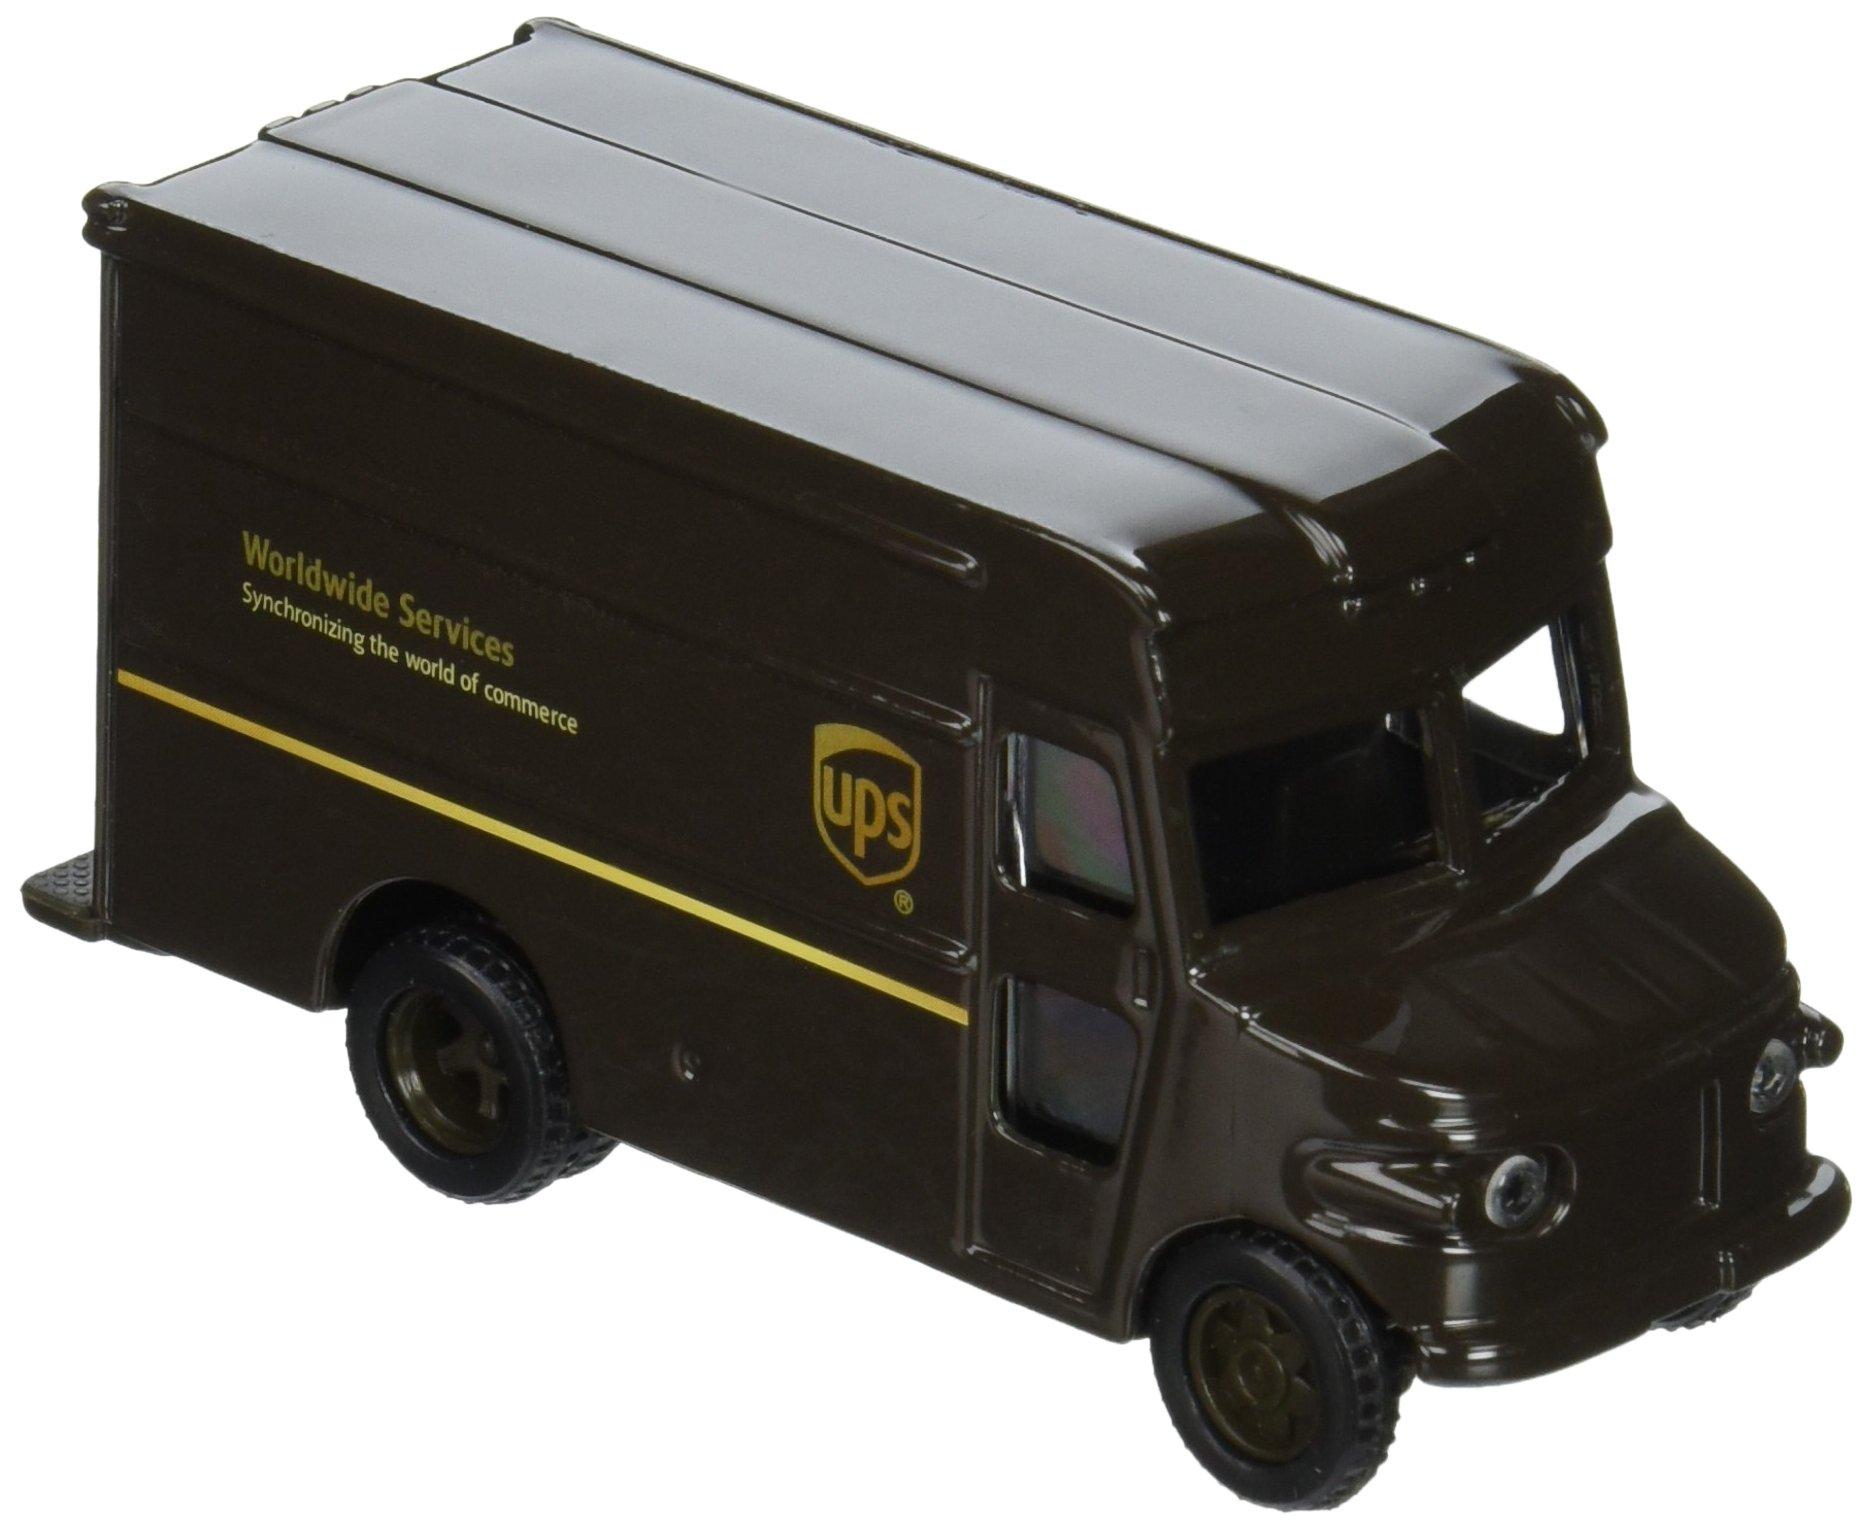 Amazon Postal Service Kid s Toy Truck Toys & Games